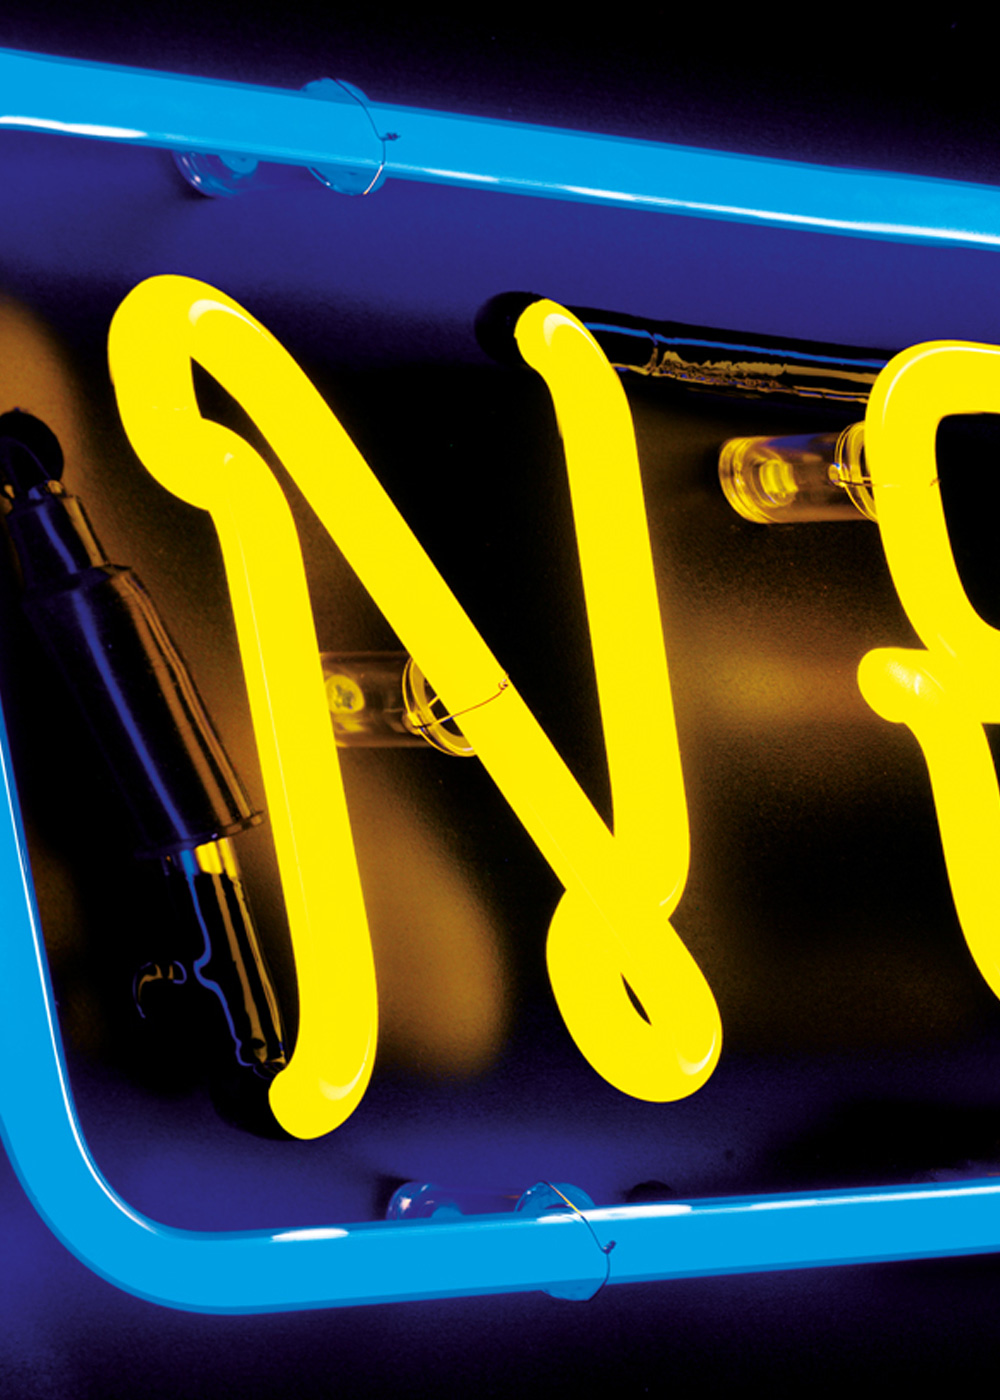 Close up image of NEEC logo